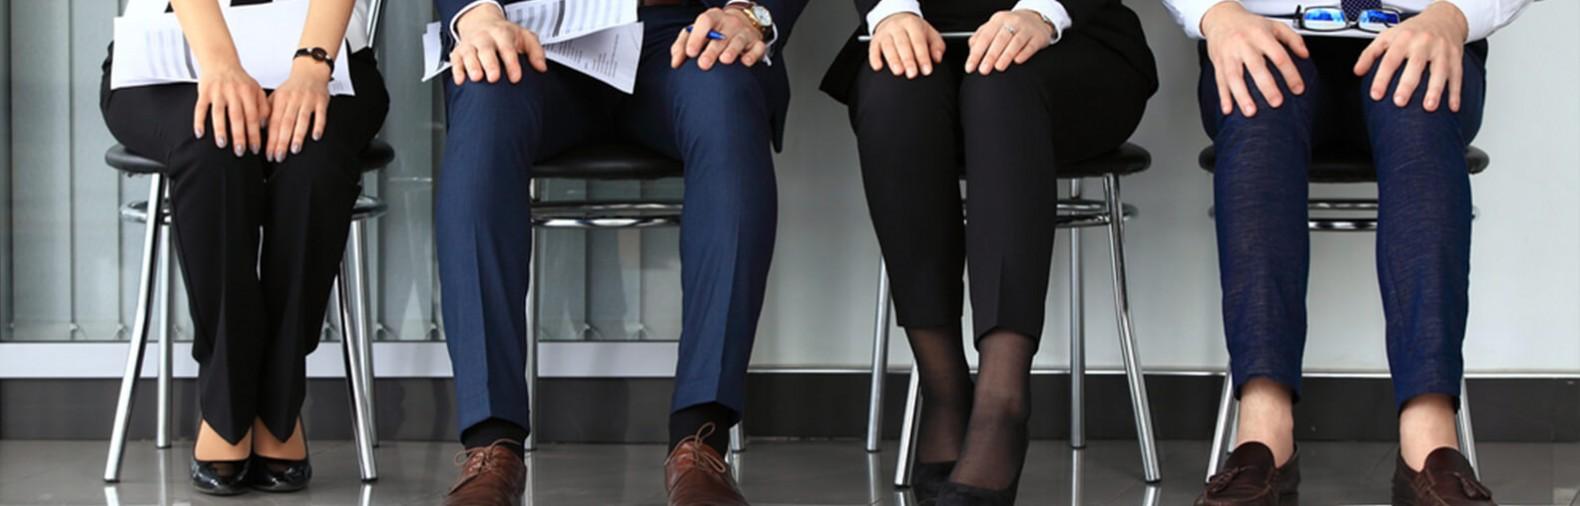 jobs werbeagentur in n rnberg f rth erlangen. Black Bedroom Furniture Sets. Home Design Ideas